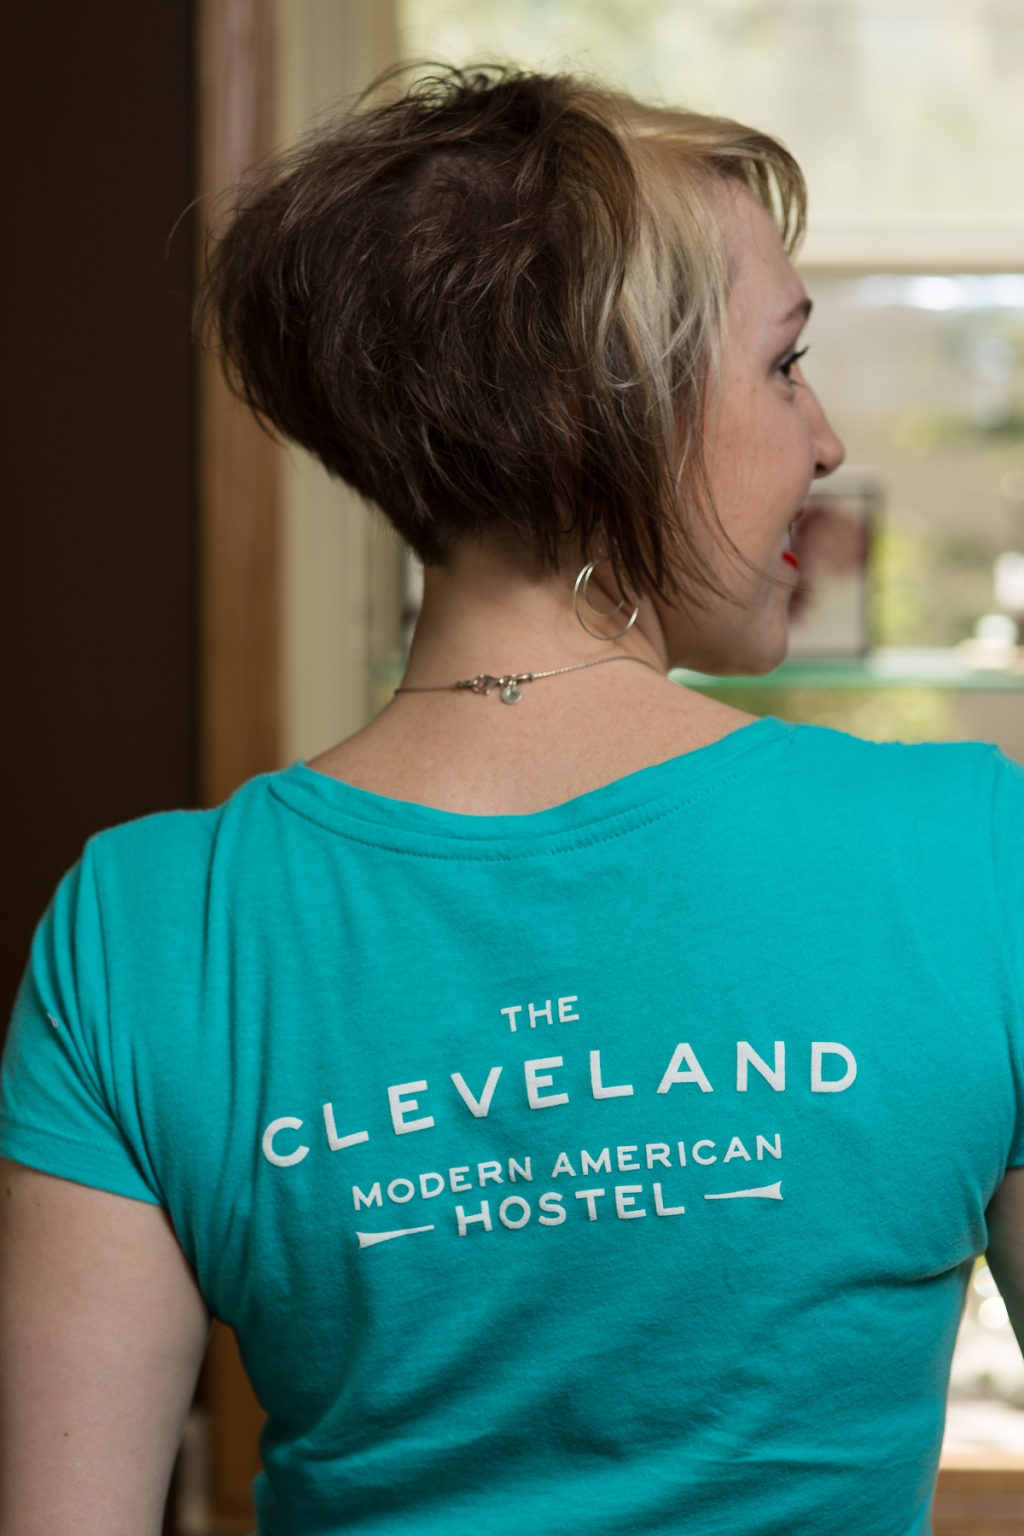 The Cleveland Modern American Hostel